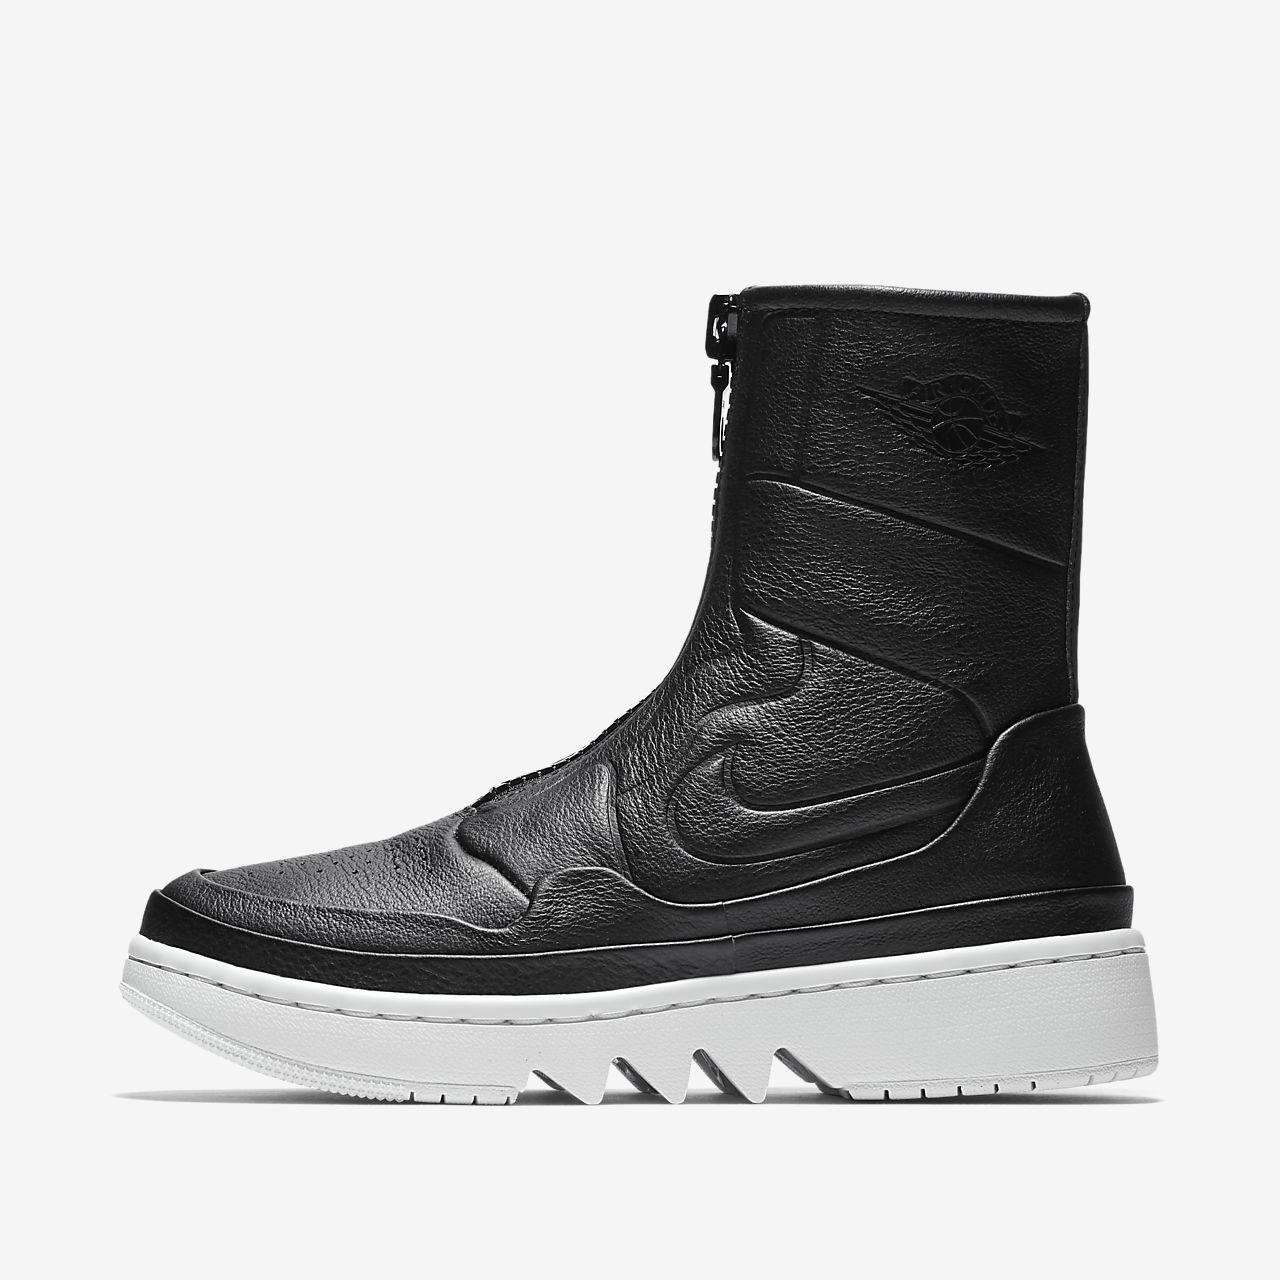 Calzado para mujer Air Jordan 1 Jester XX